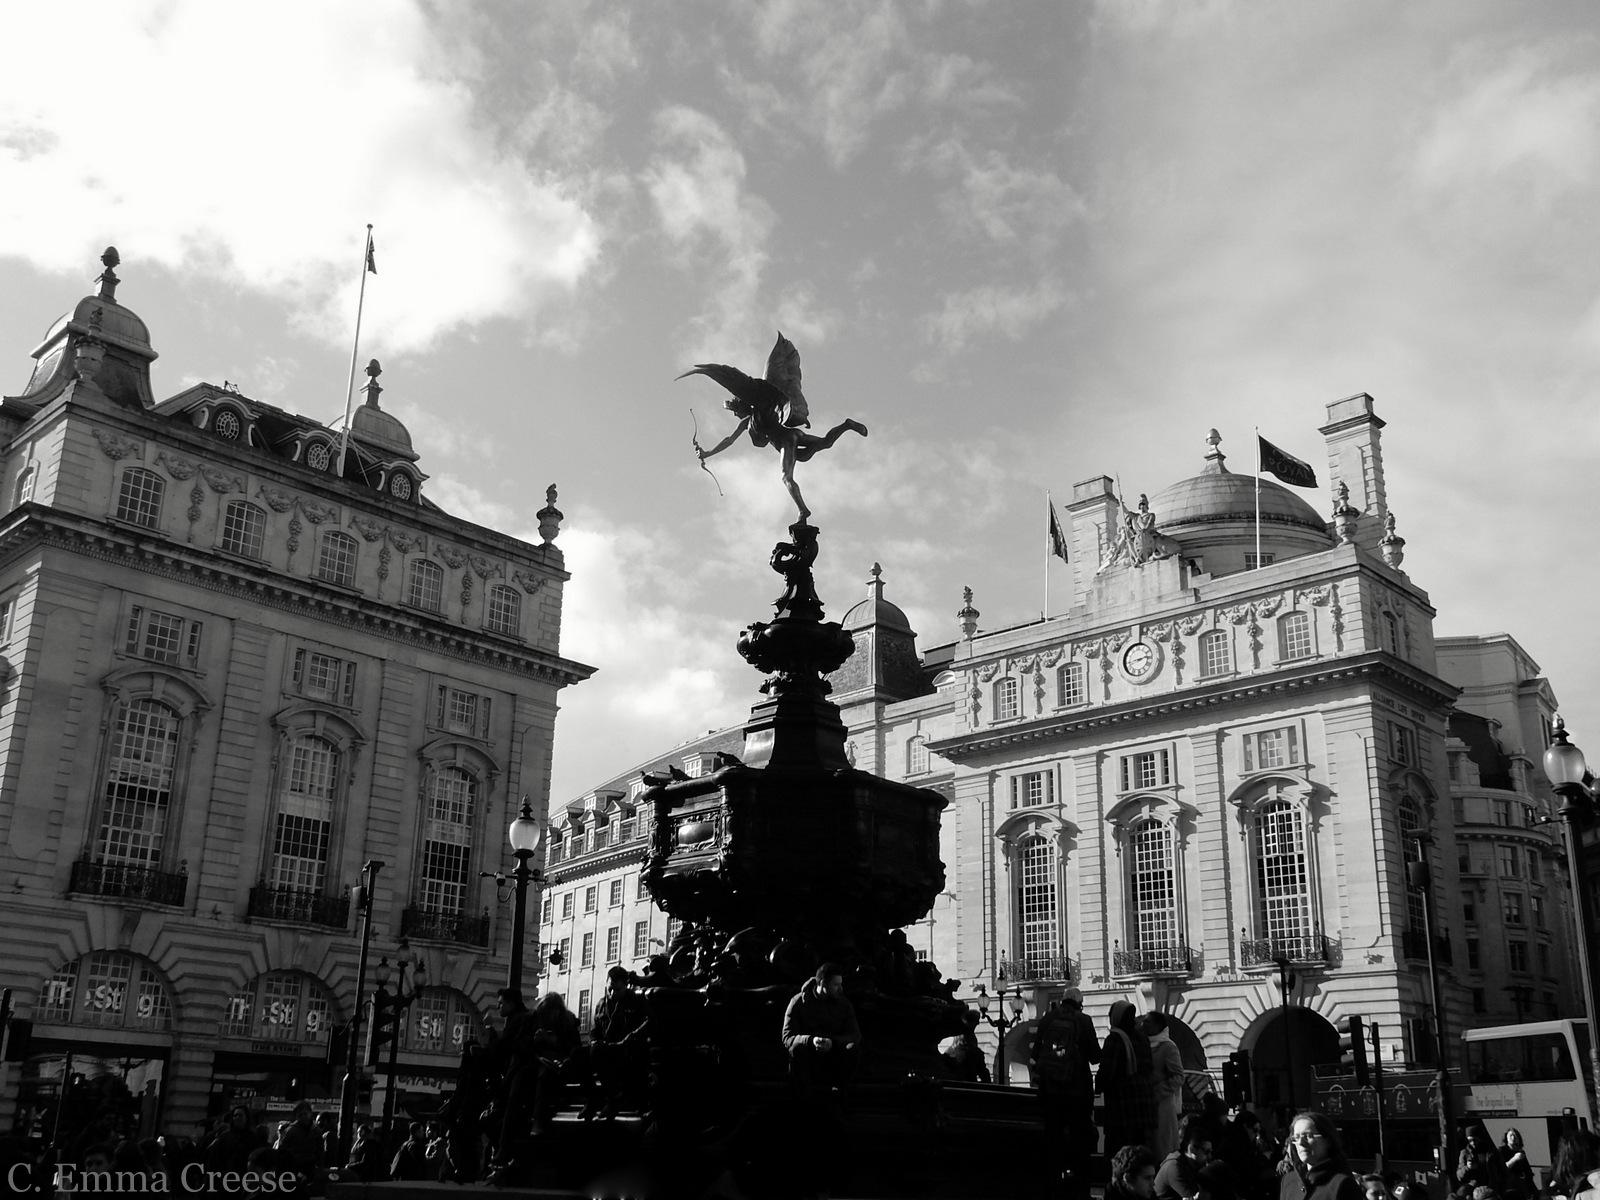 9 ways to make living in London easier